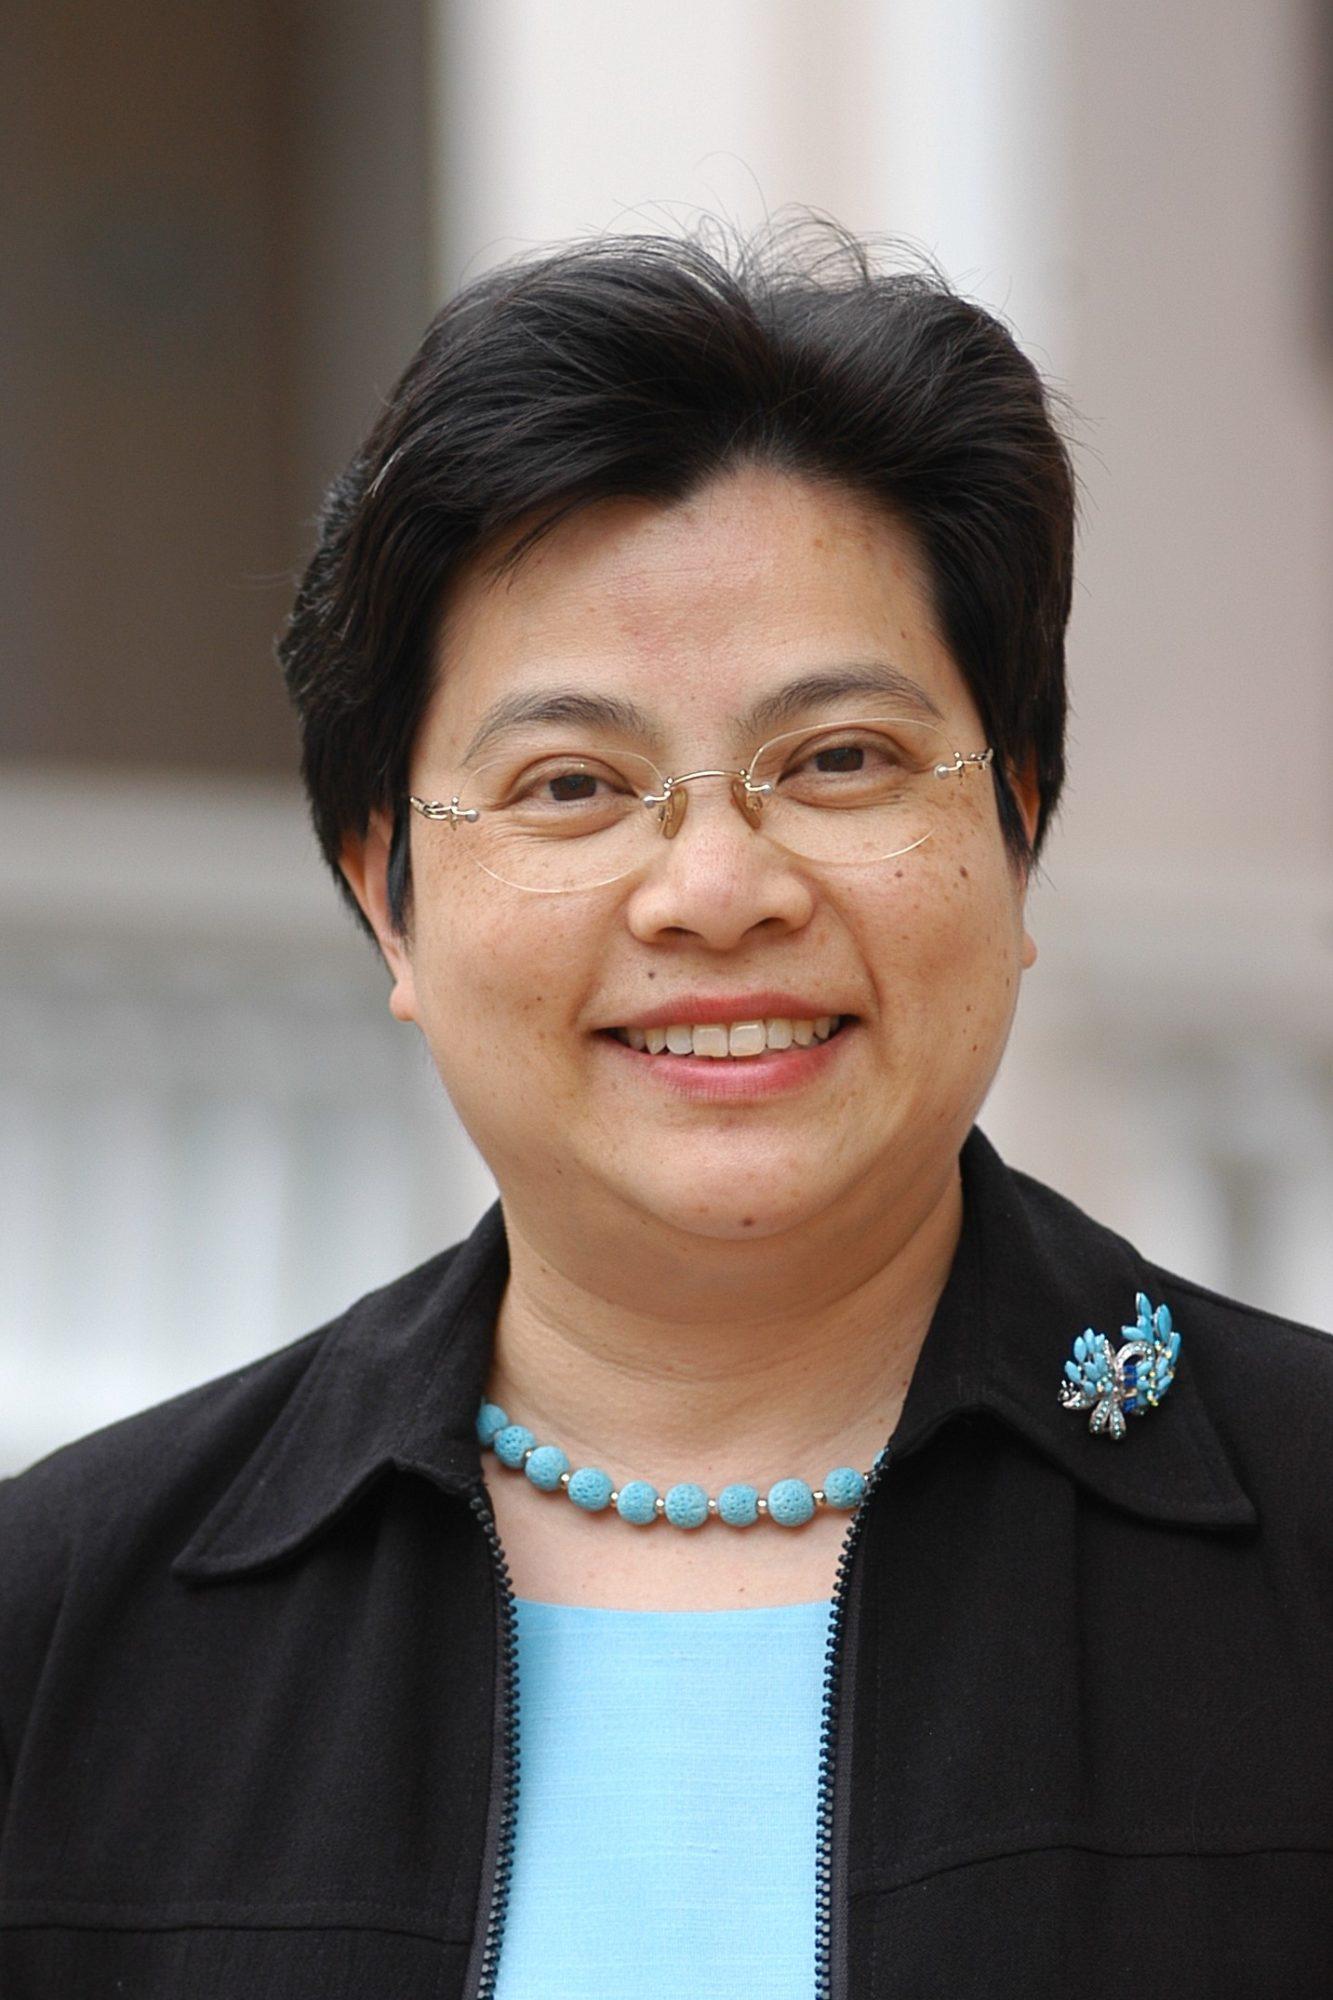 國際培幼會 » Dr TSANG Sandra K M skyblue